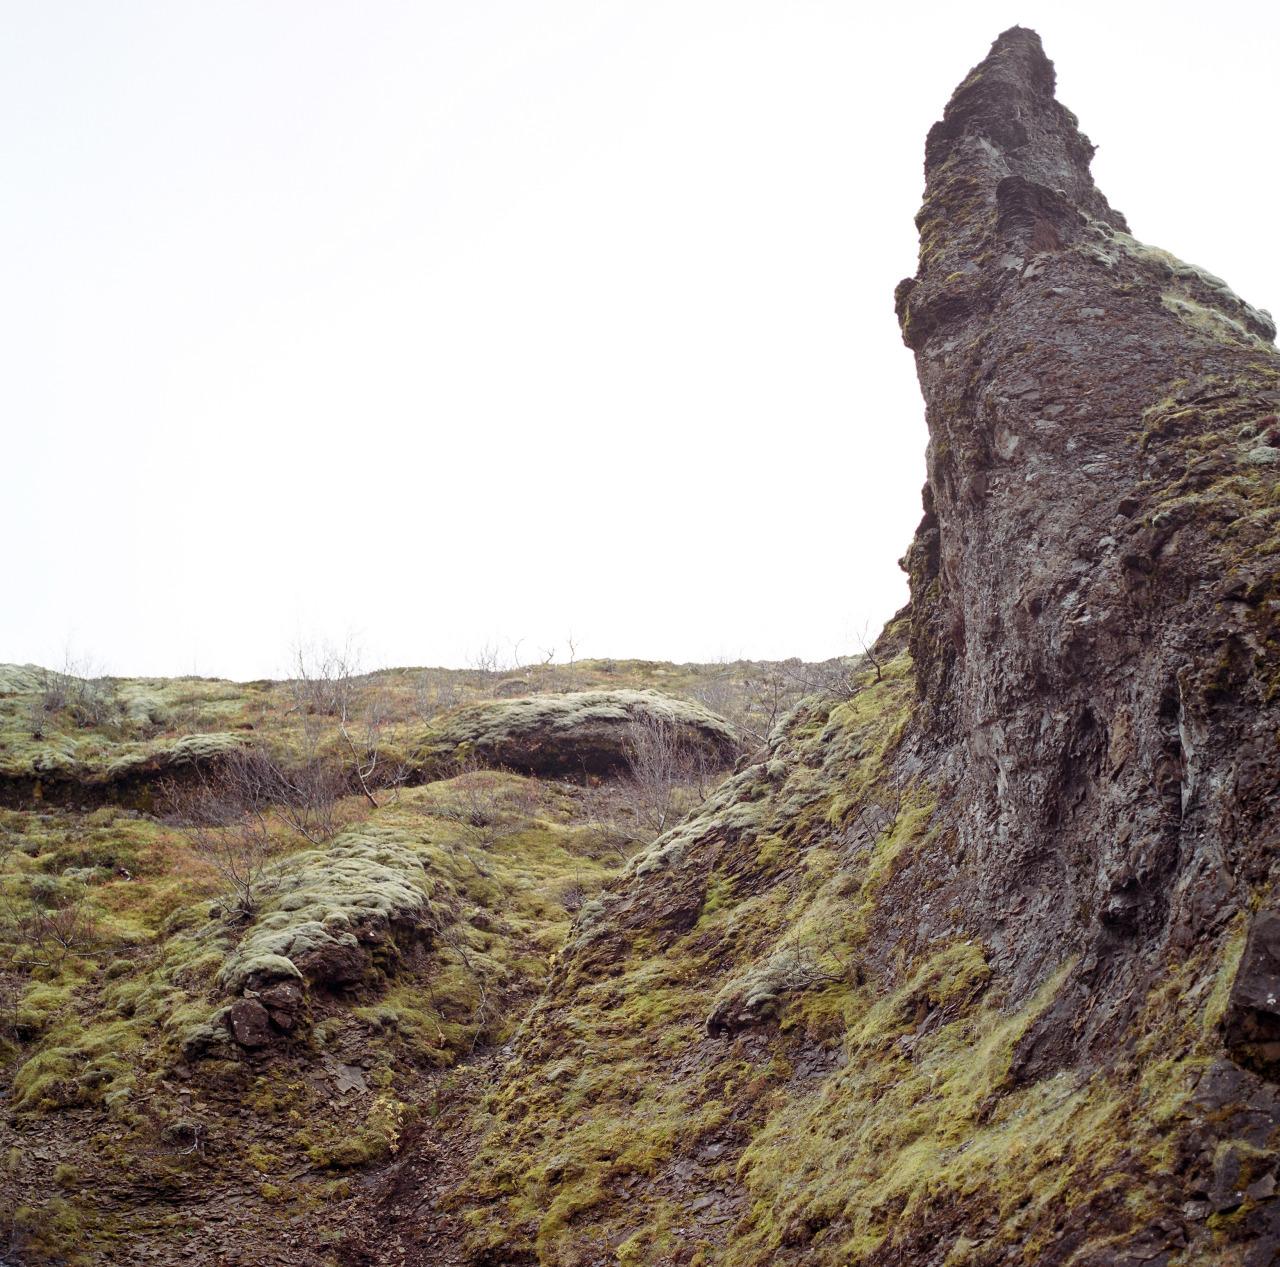 Lava formation - hiking near Botnsdalur.   Kodak Portra 400//Hasselblad 500CM